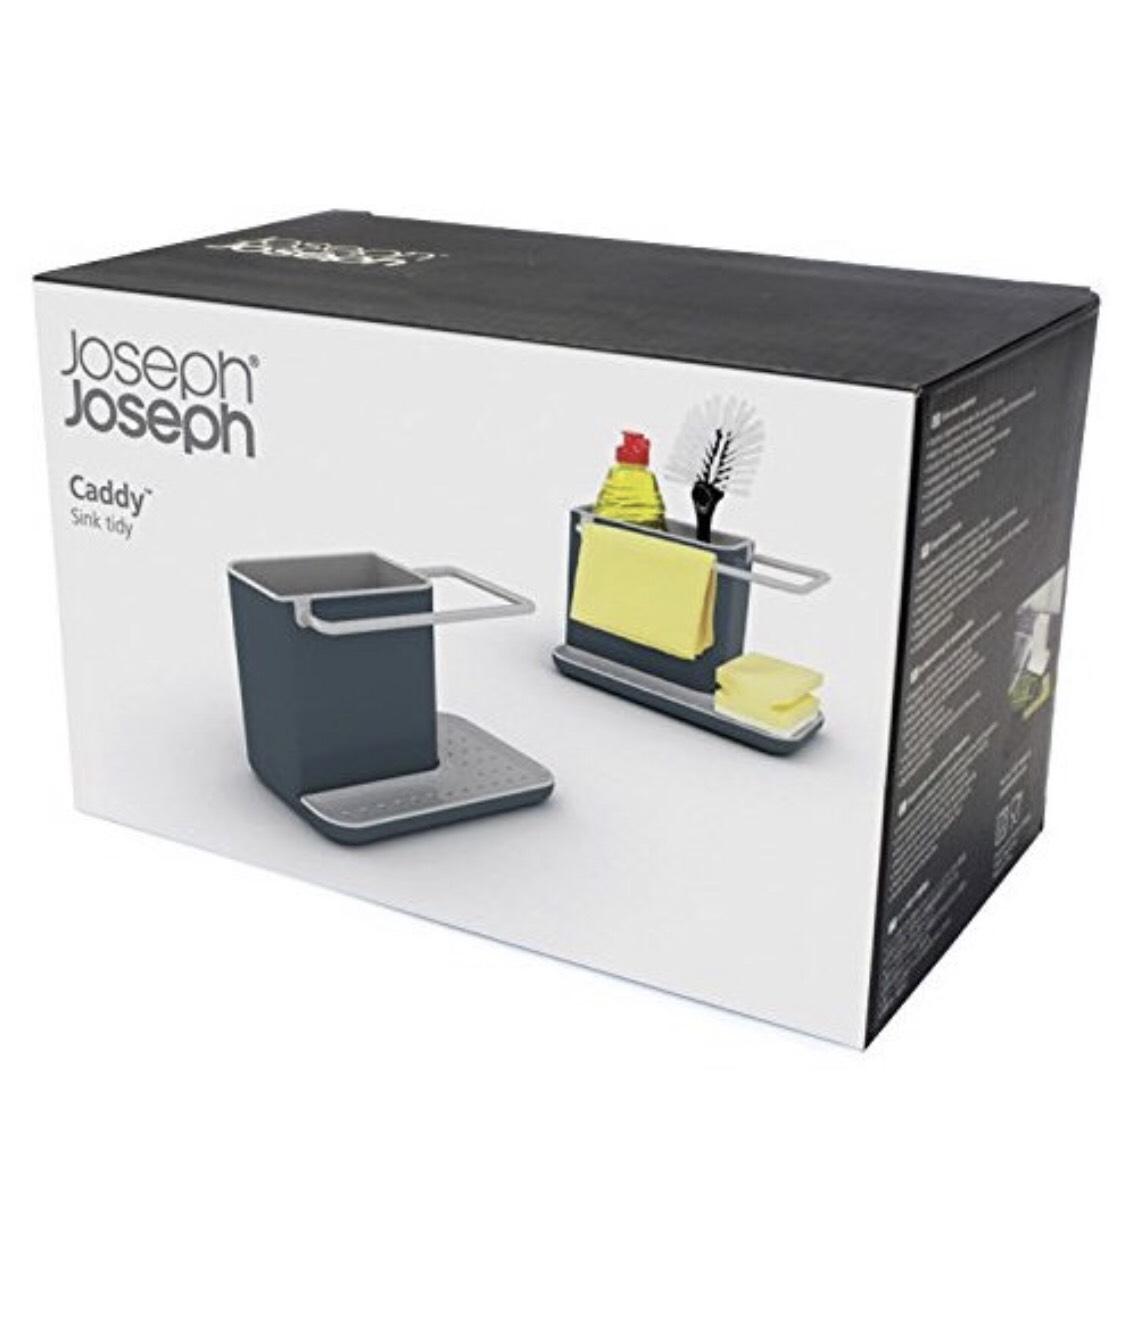 Joseph joseph Grey colour Candy Sink area organiser £12 (Prime) £16.49 (Non Prime) @ Amazon